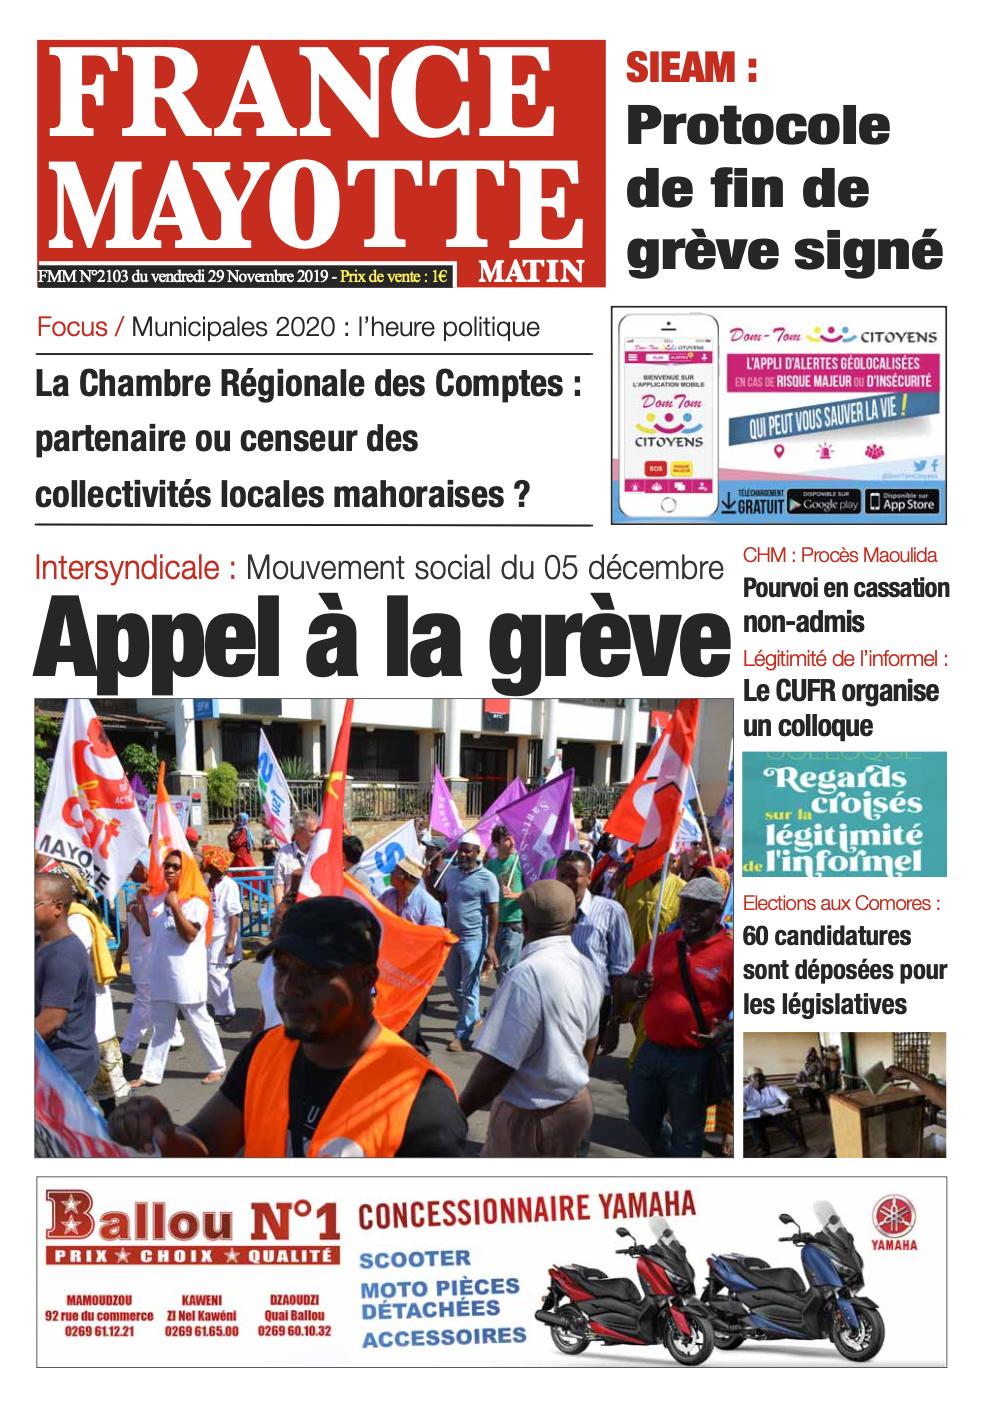 France Mayotte Vendredi 29 novembre 2019